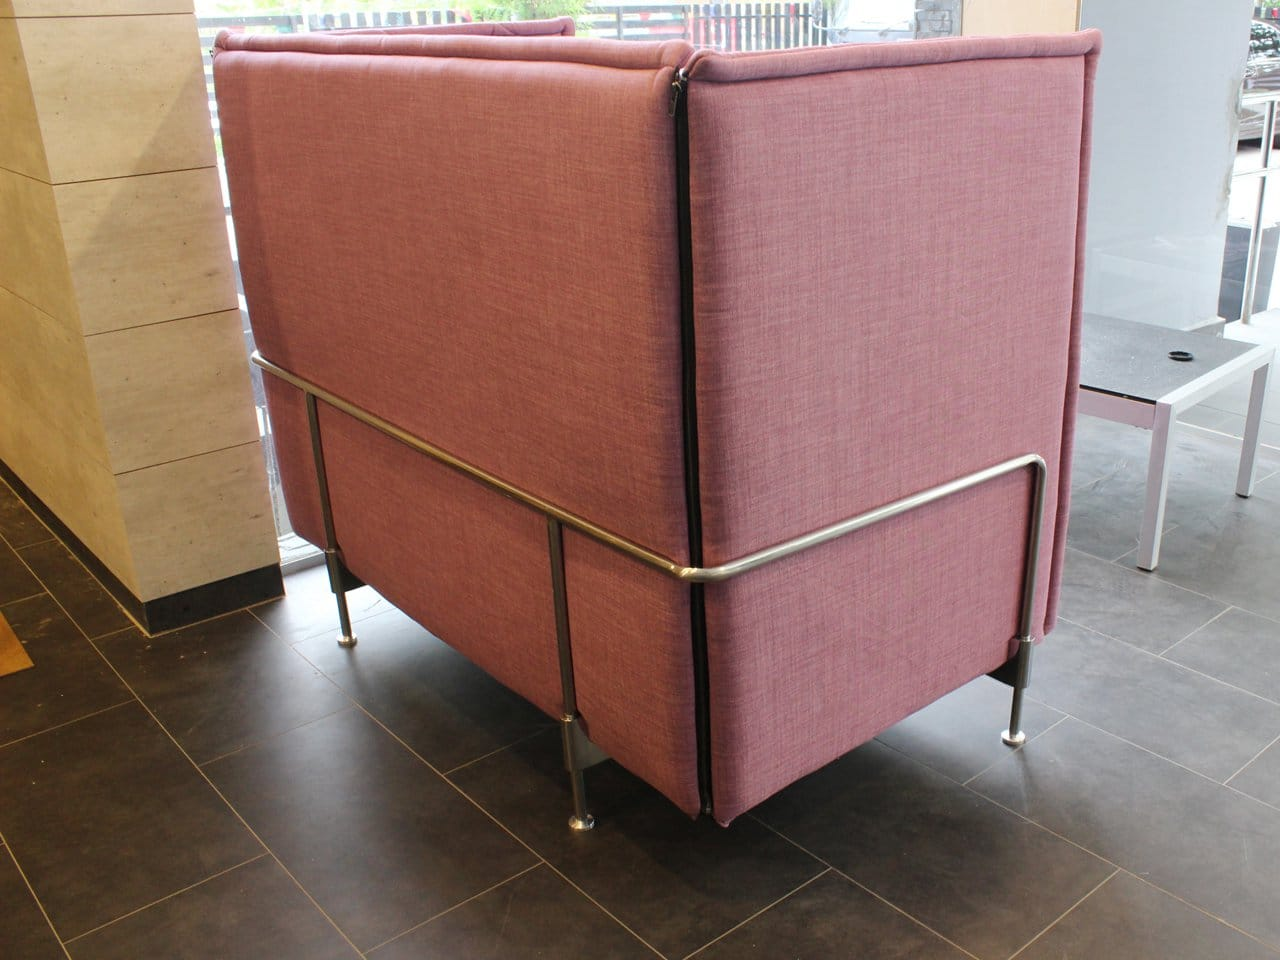 Enclosed 2 Seater Sofa Midback Comfort Design The